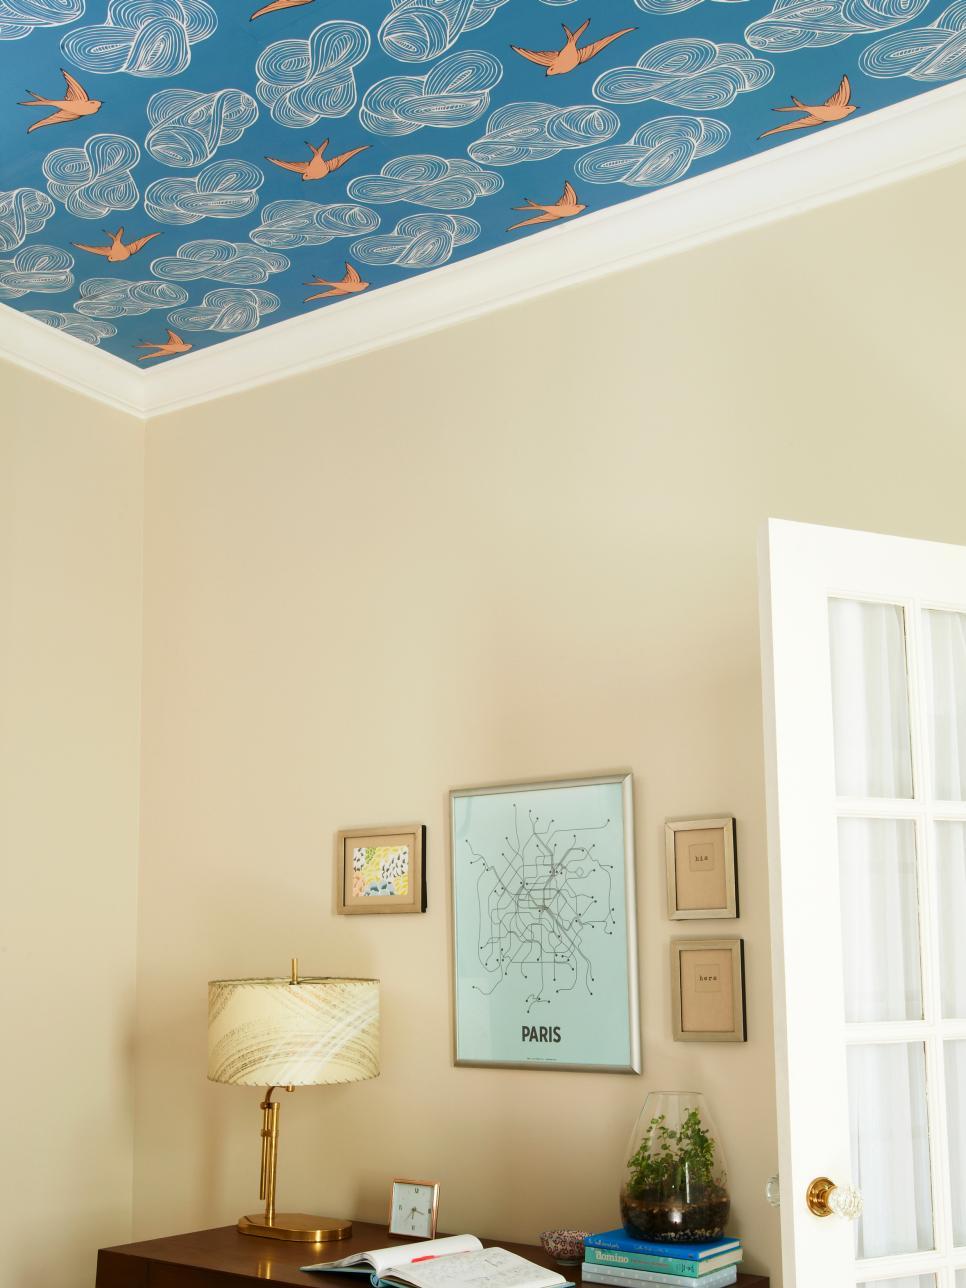 hgtv-bird-wallpaper-on-ceiling